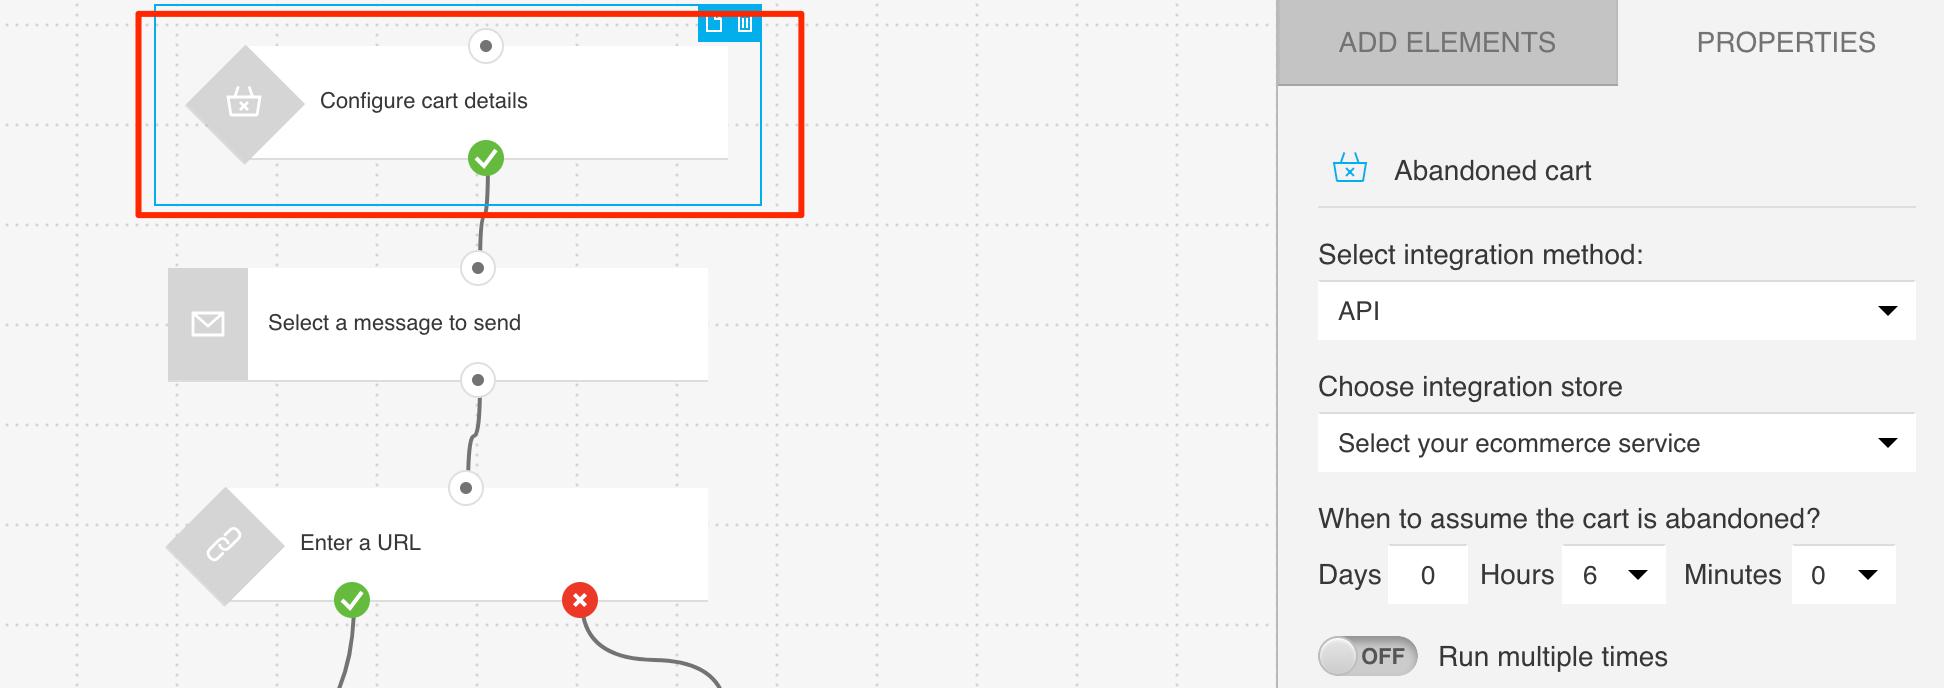 Configuration option for Abandoned cart using API integration